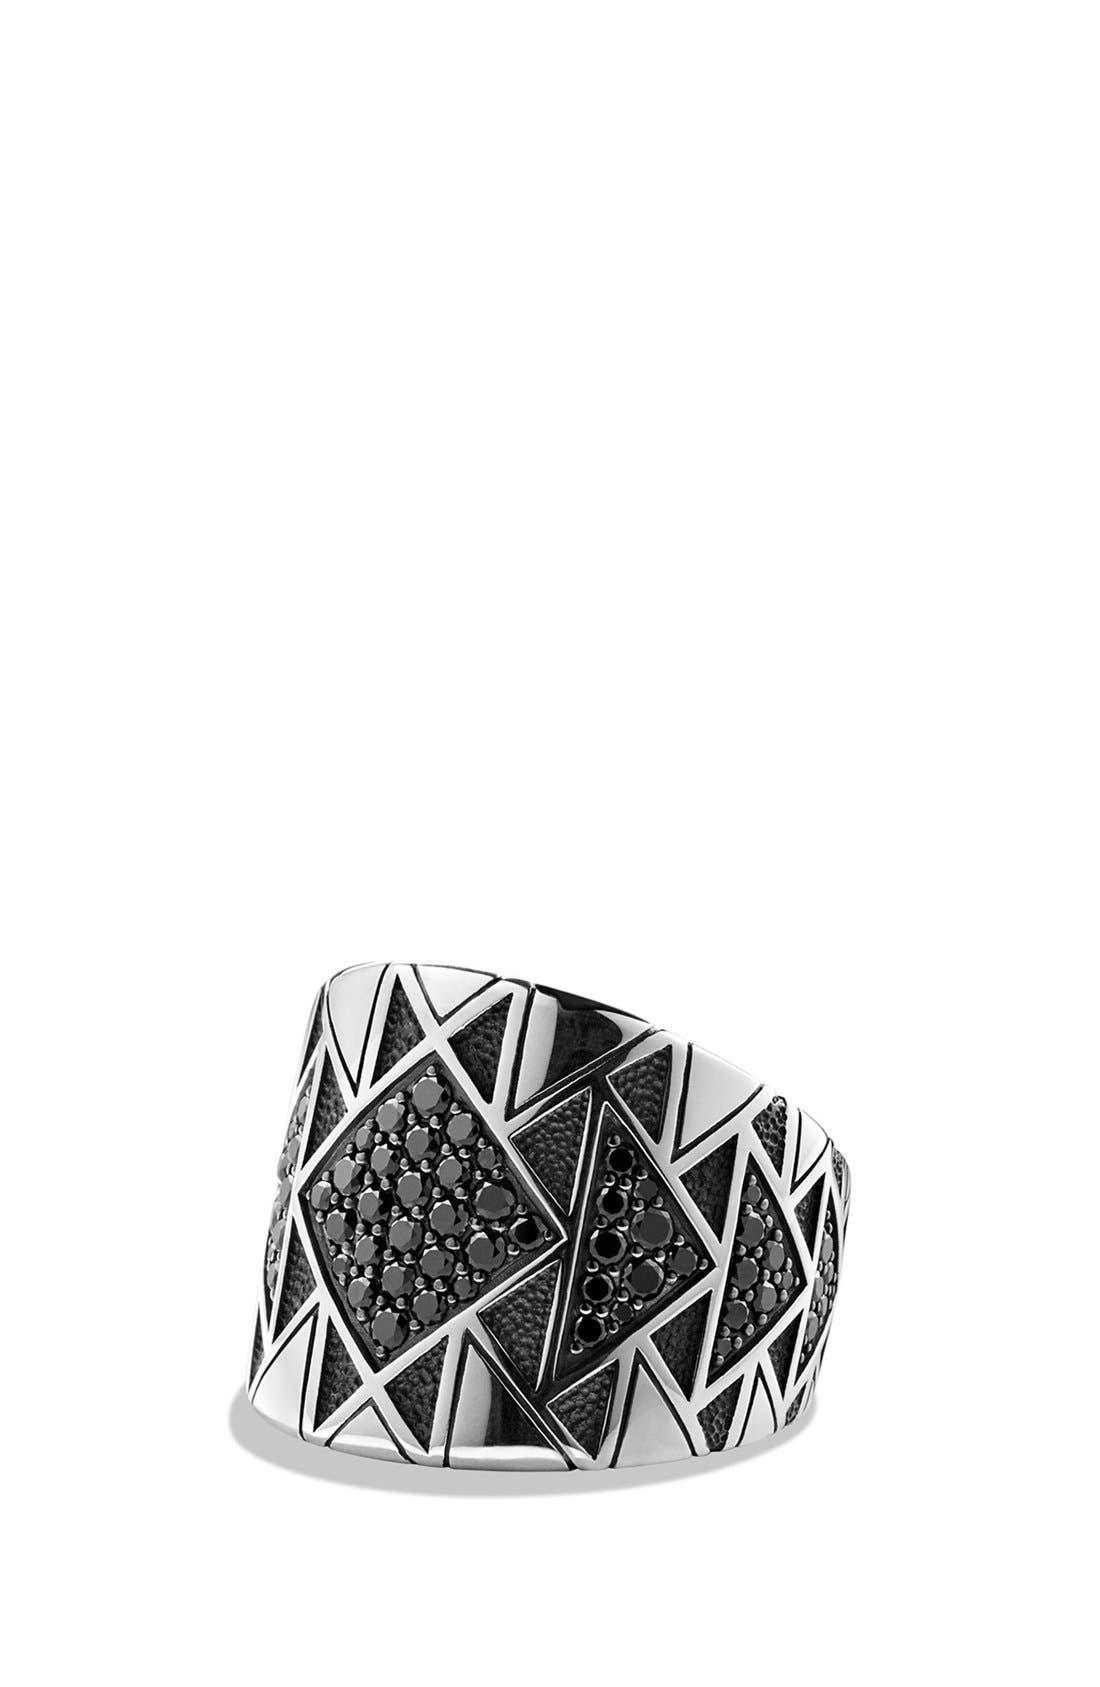 Southwest Signet Ring with Black Diamonds,                             Main thumbnail 2, color,